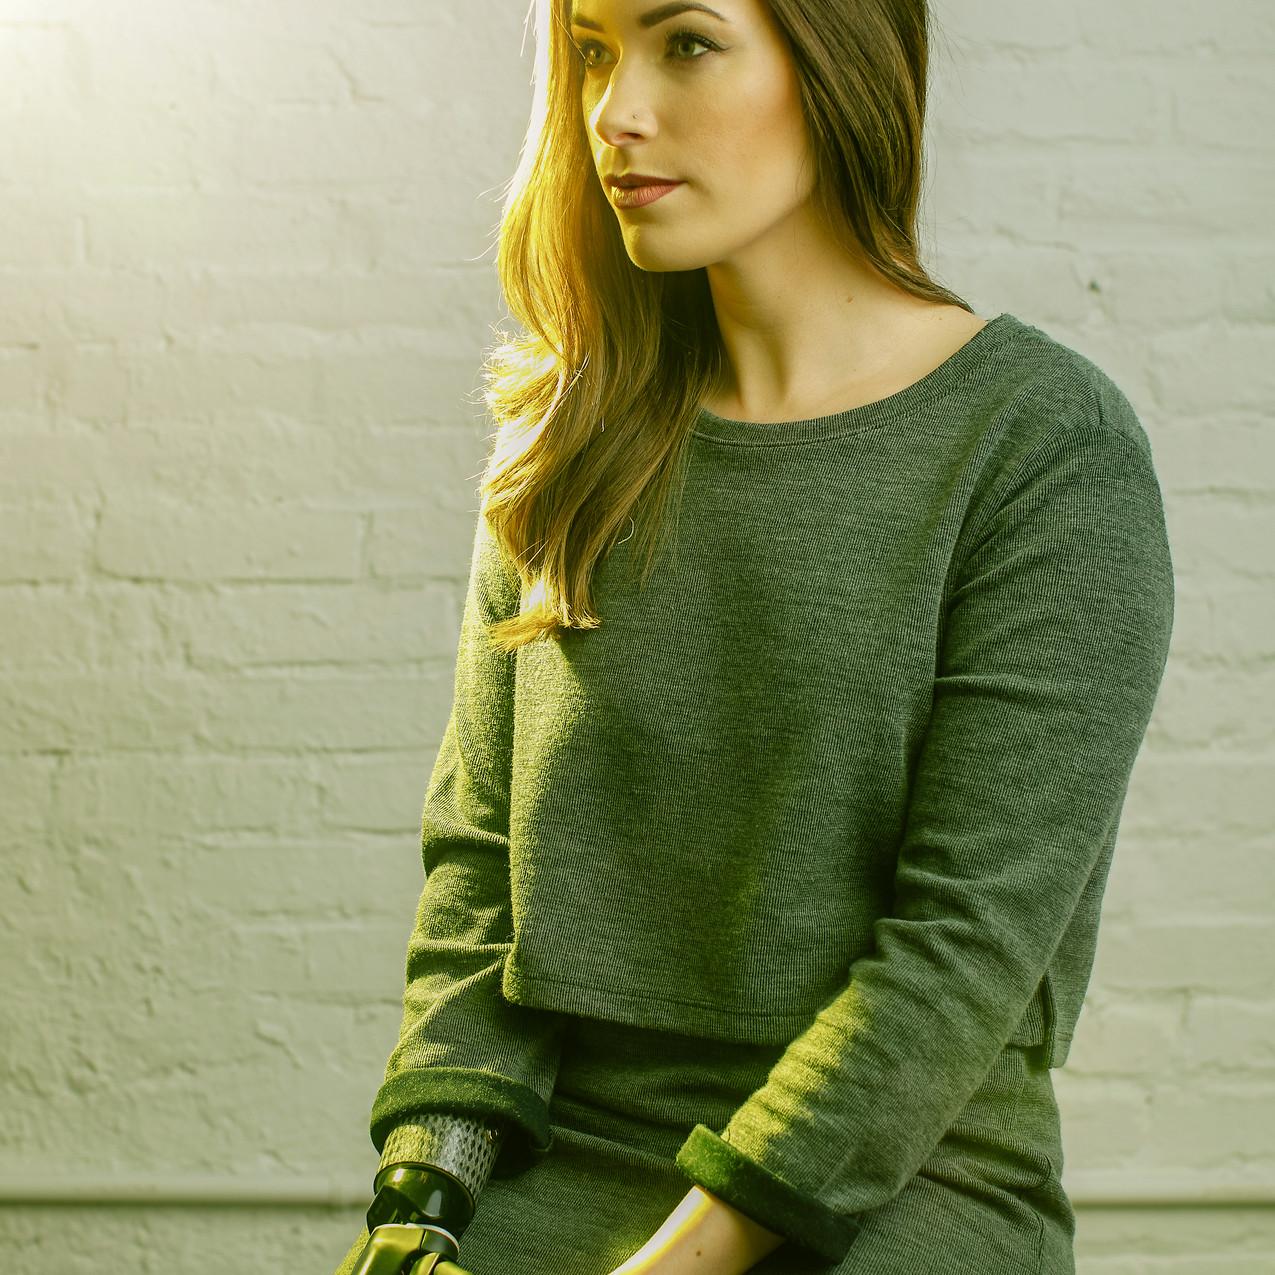 Bionic Amputee Model Rebekah Marine